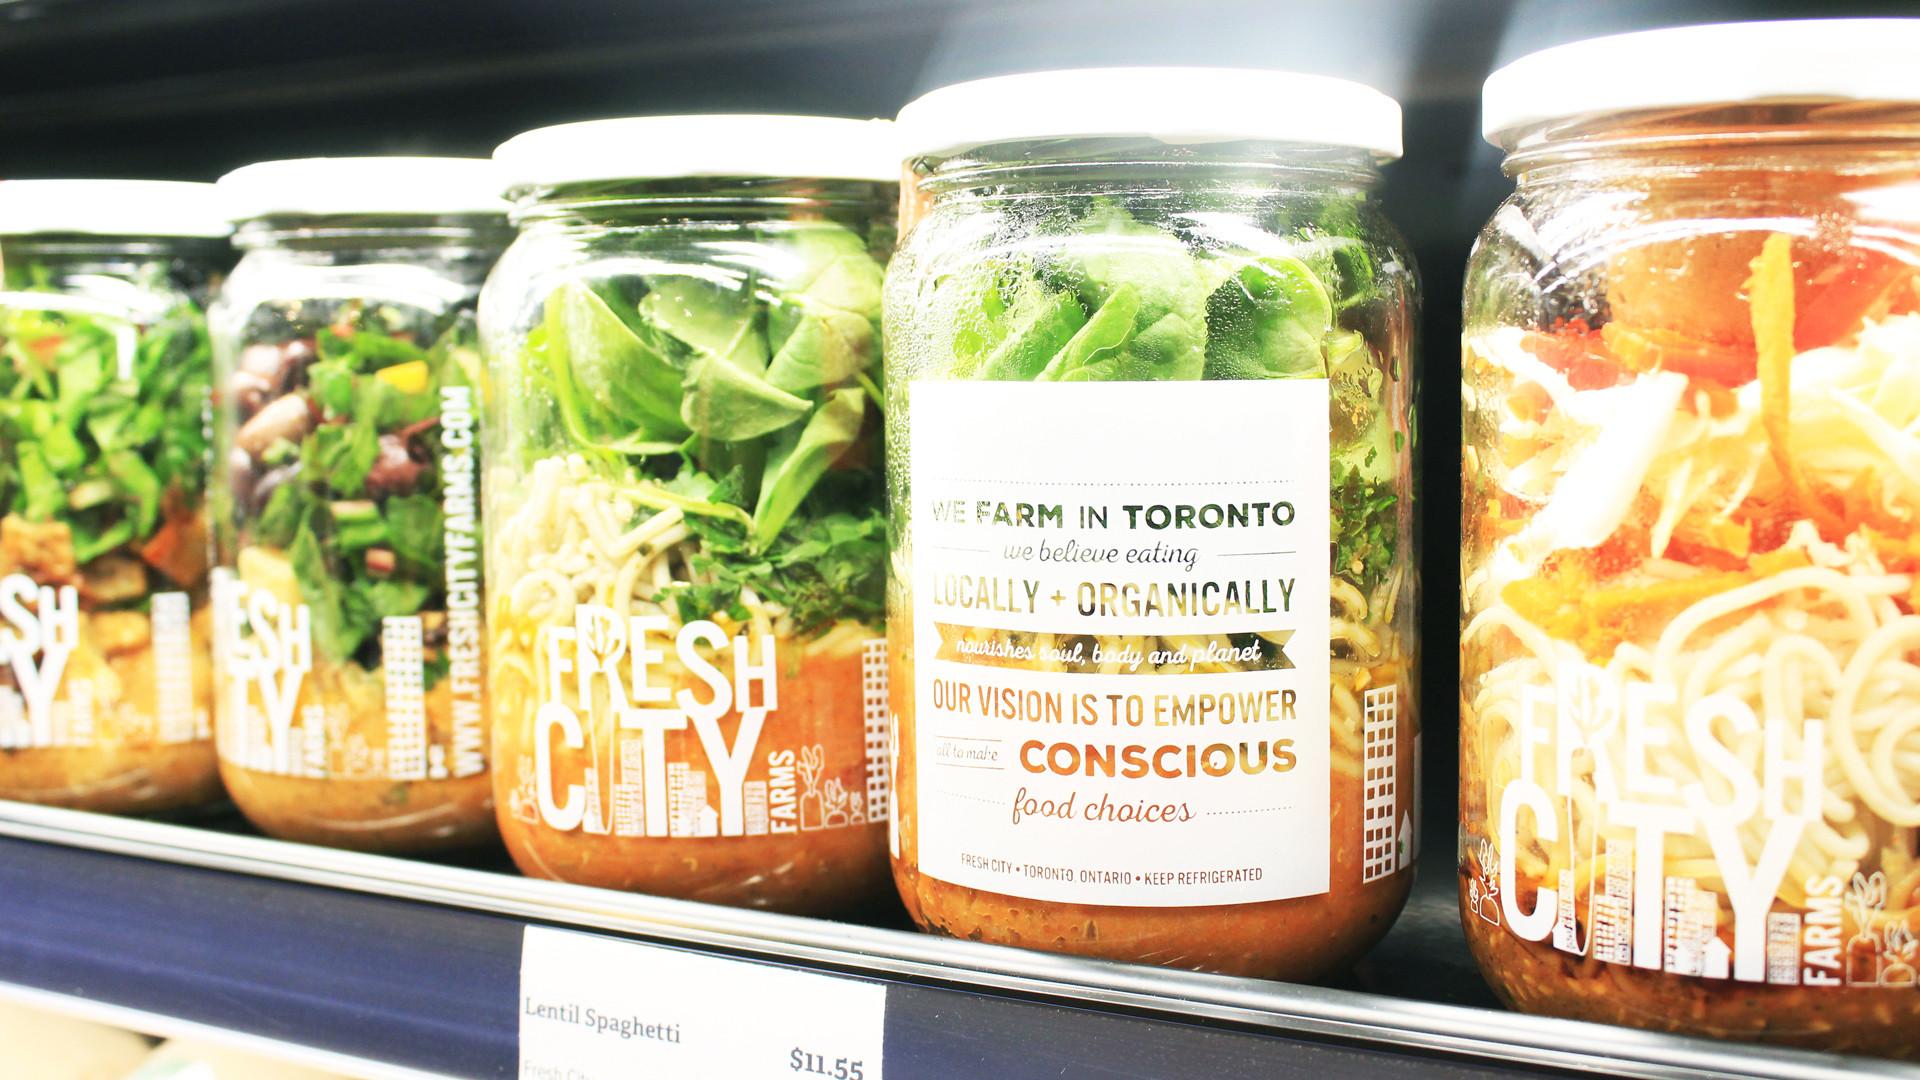 Salad jars on the shelf at Fresh City Farms